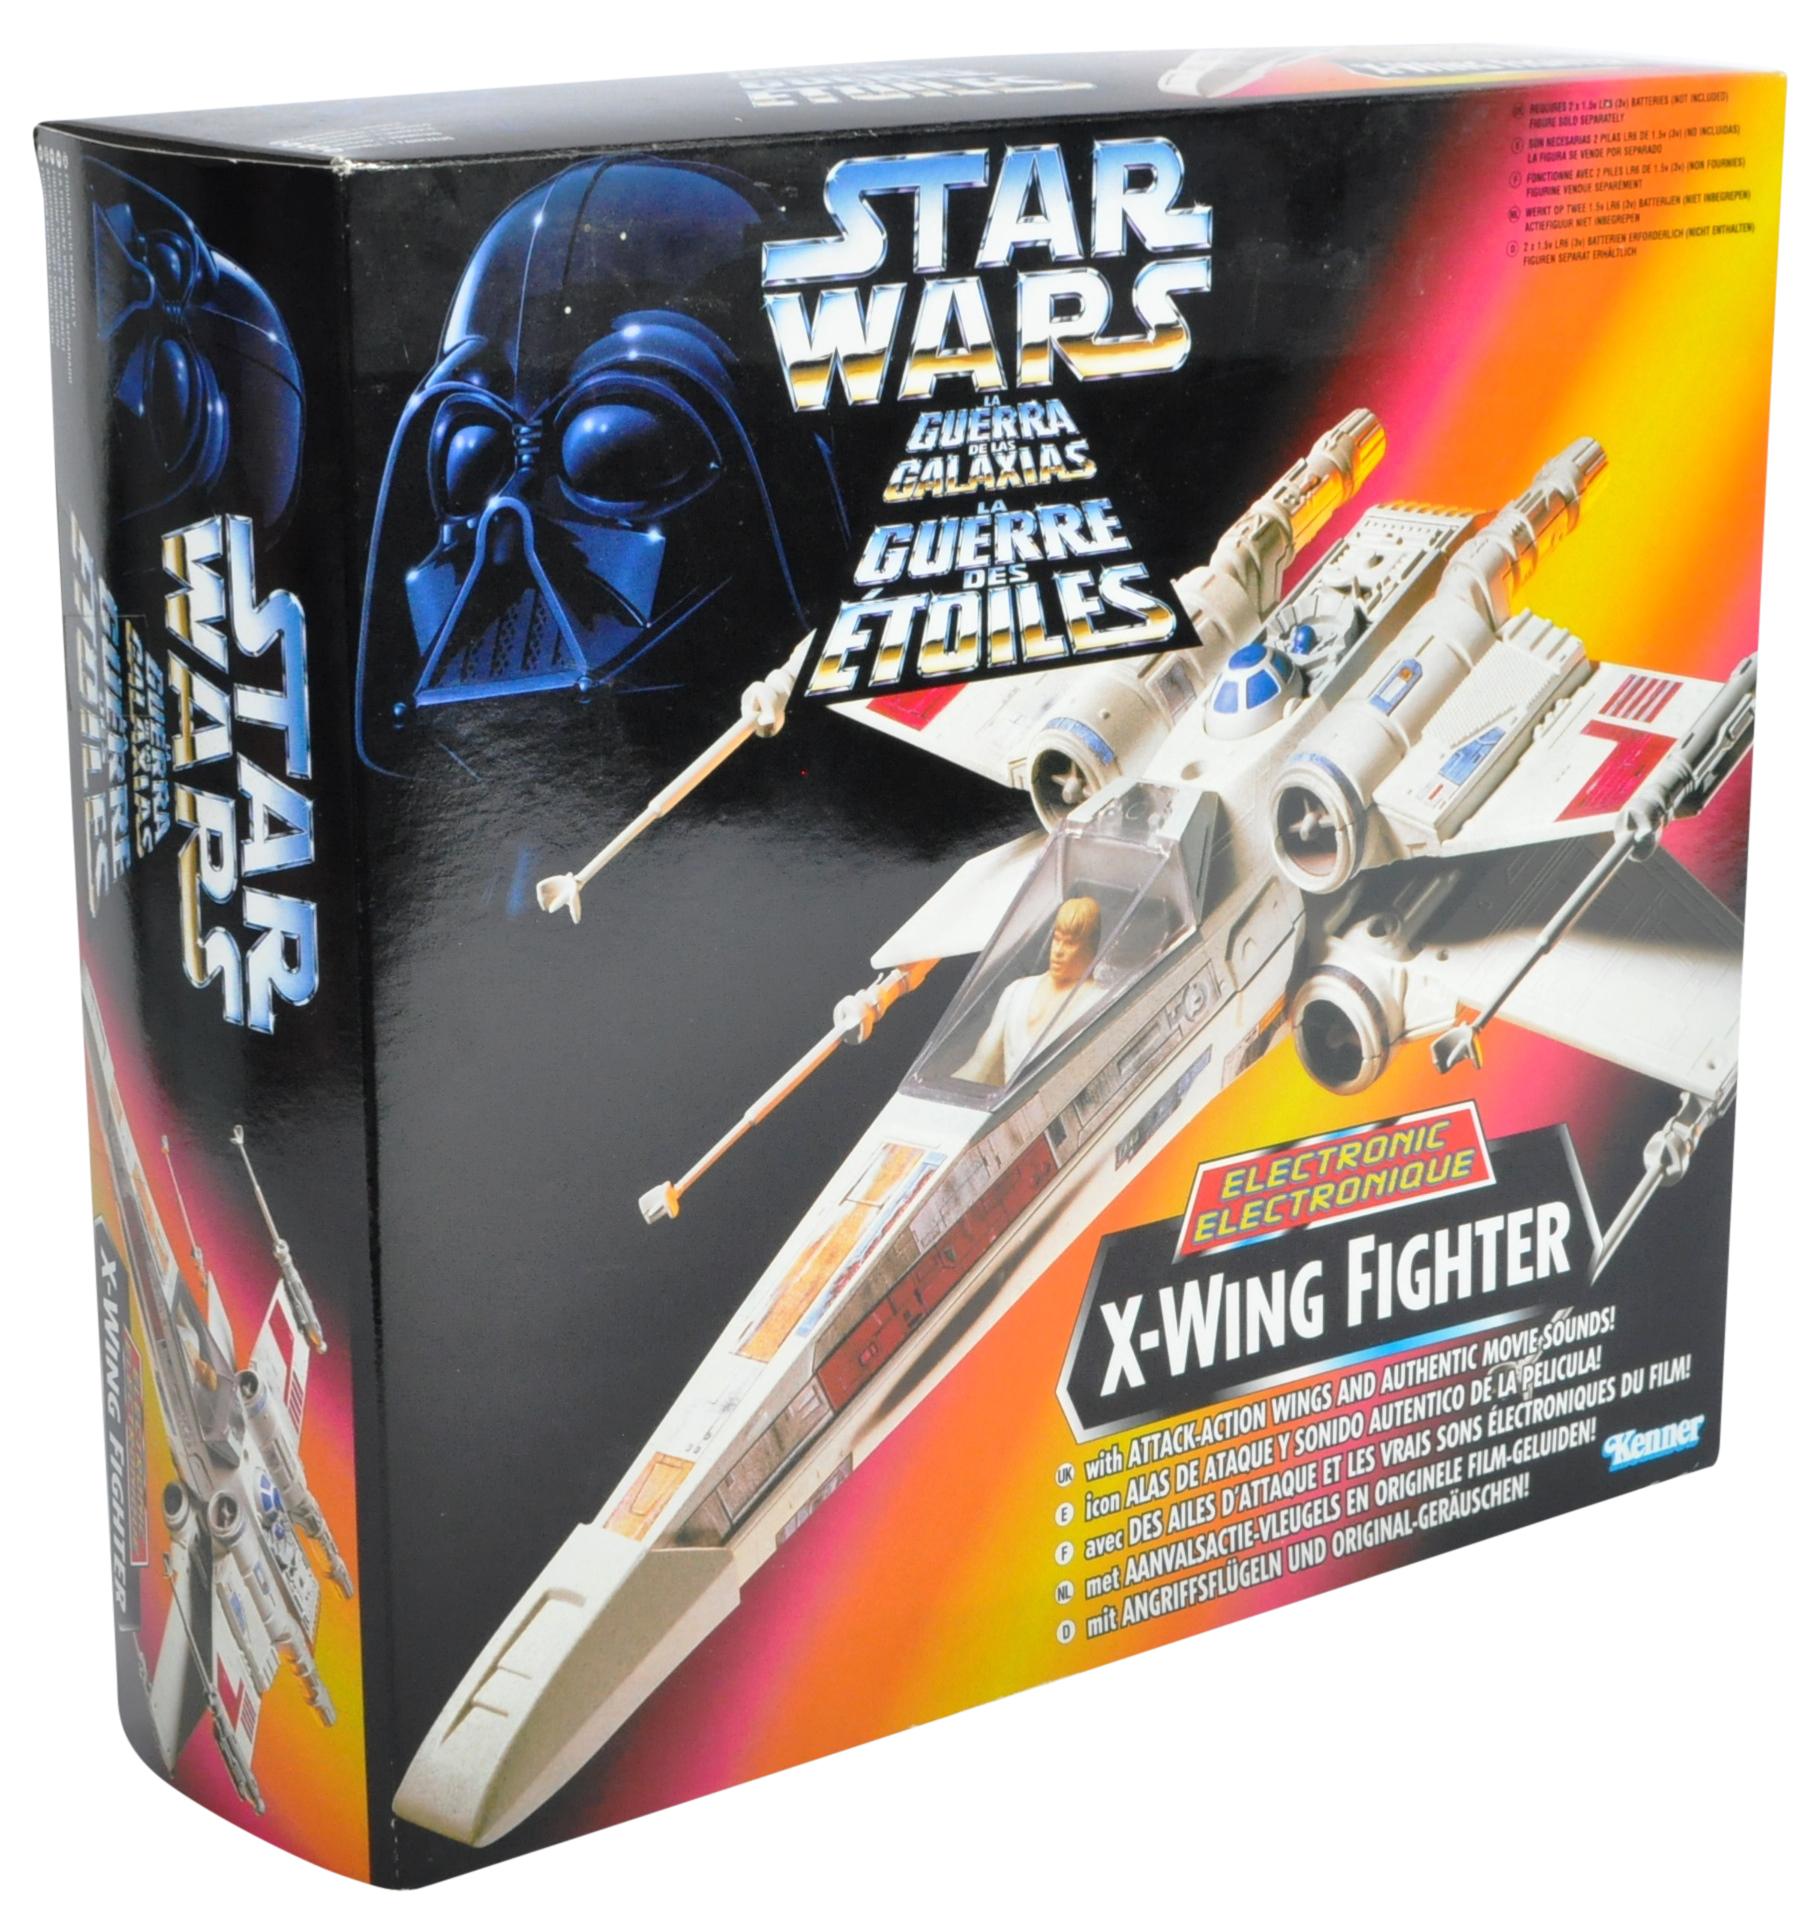 STAR WARS -VINTAGE KENNER BOXED ACTION FIGURE PLAYSET